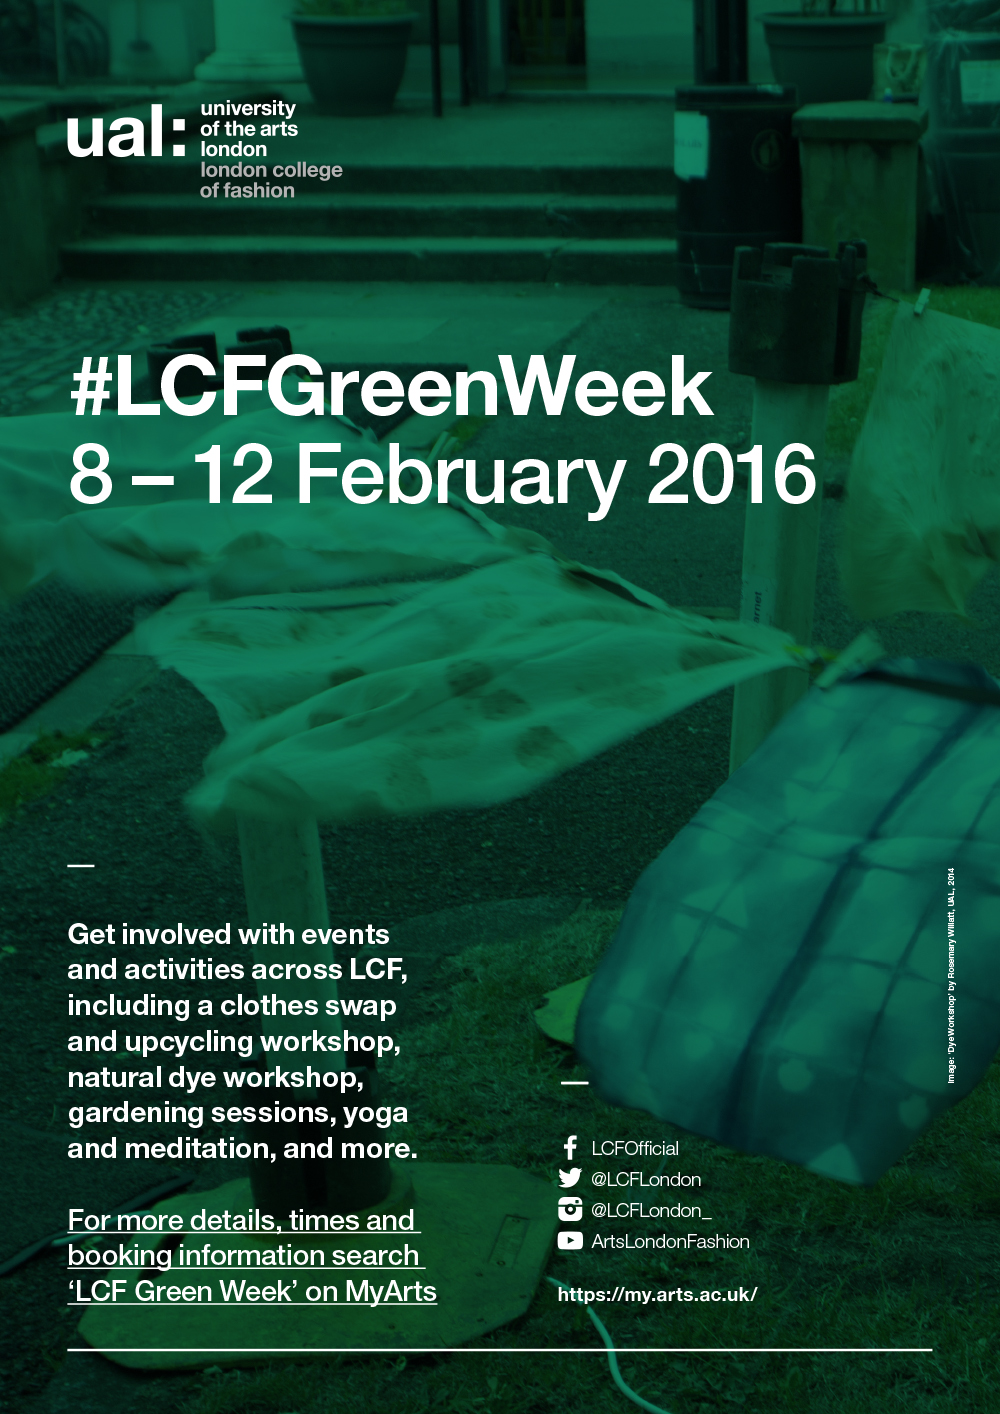 00138_LCF-GreenWeek_poster_1000px